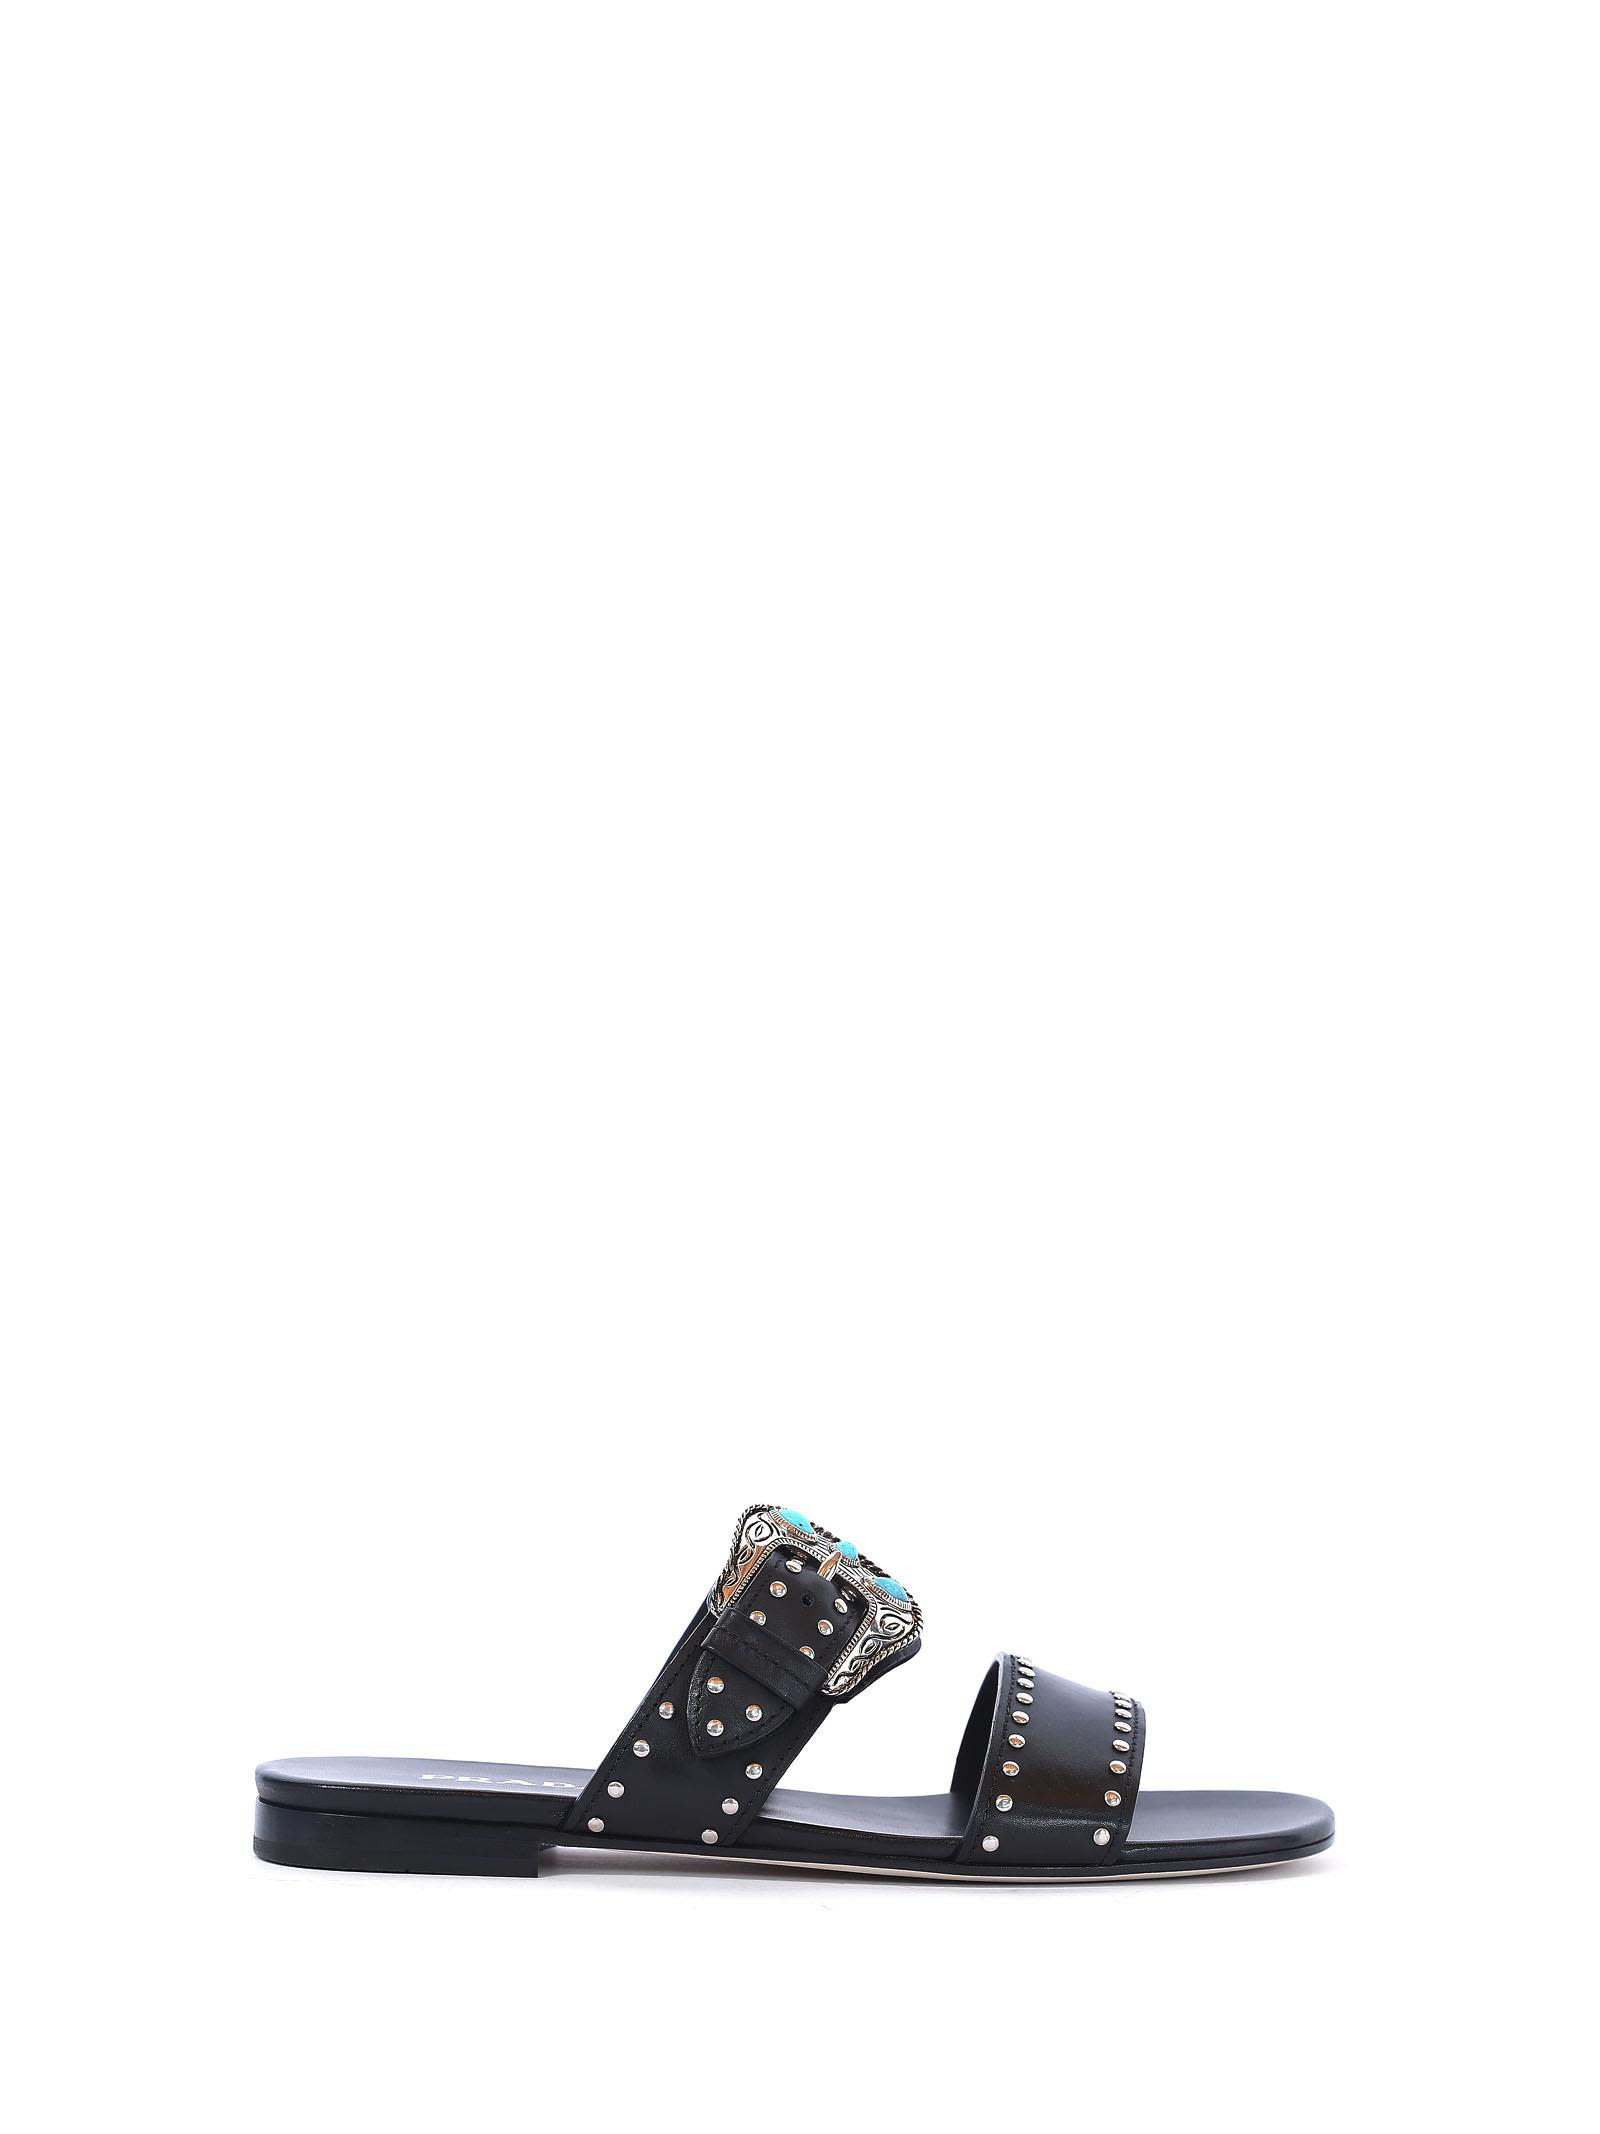 Prada Soft Calf Flat Sandal